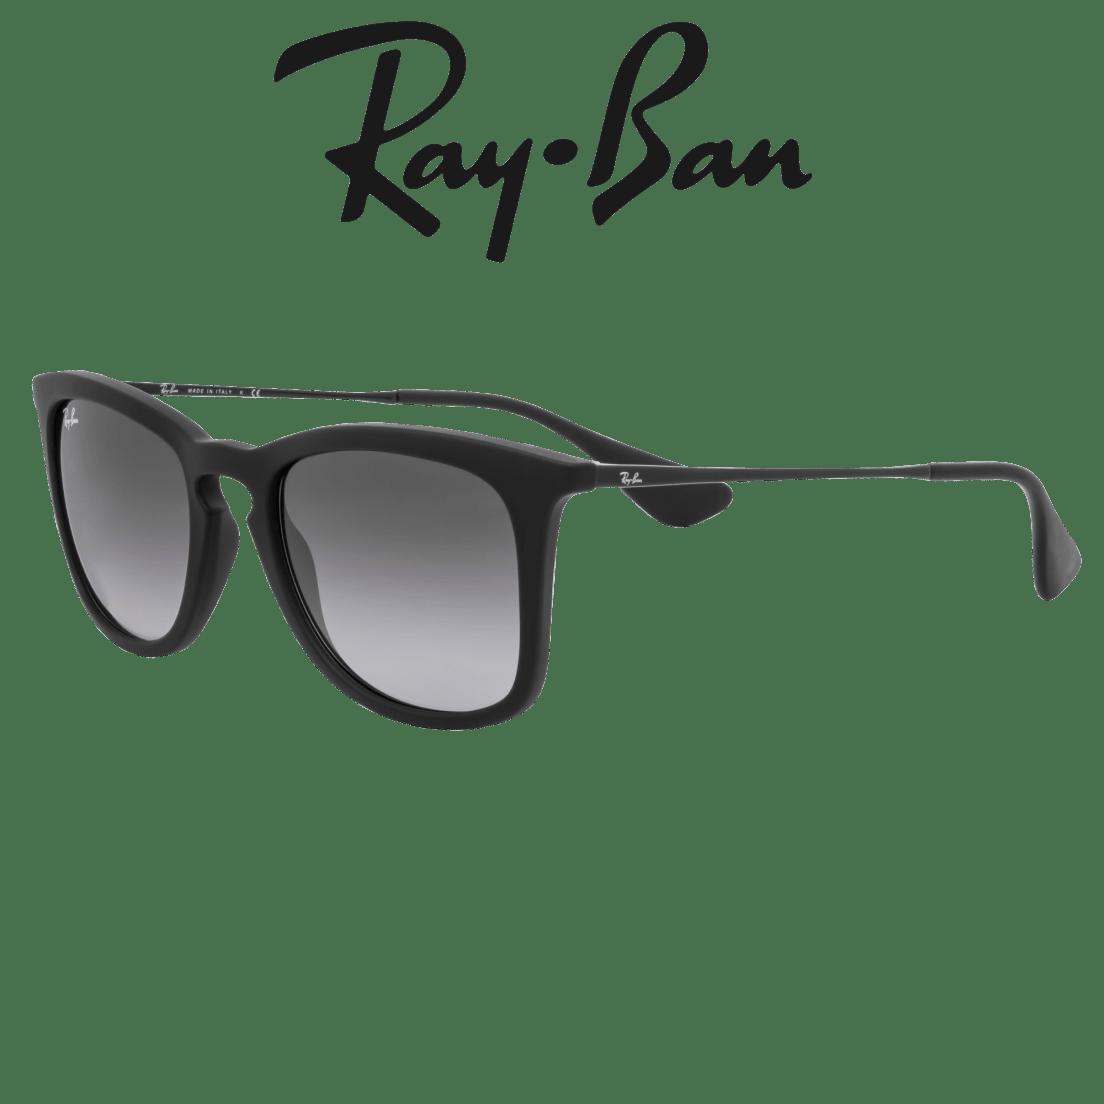 b6f37ea148b92 Ray-Ban RB4221 Sunglasses with Black Grey Gradient Lenses